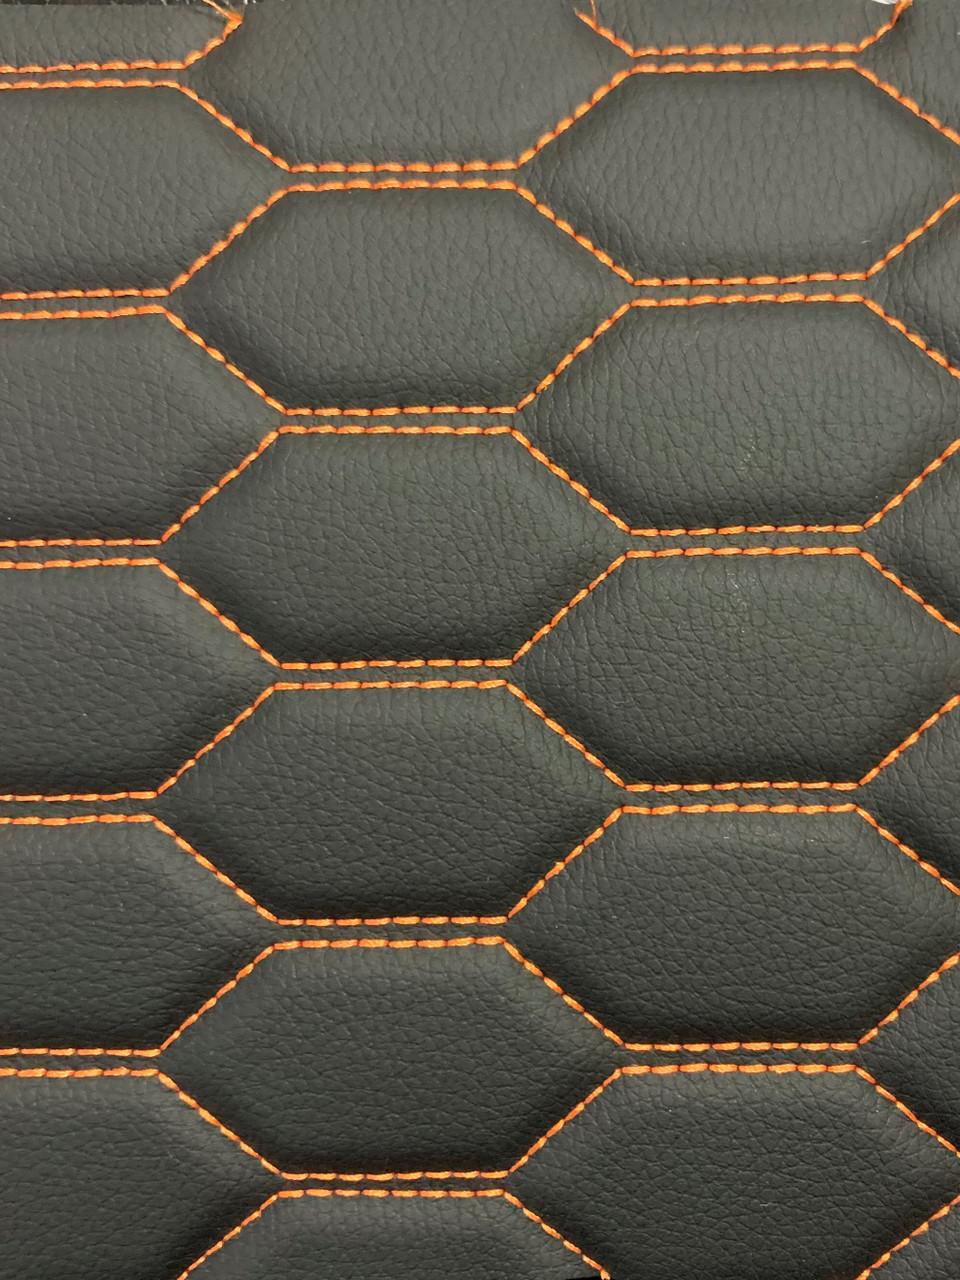 Quilted automotive grade black vinyl with orange stitching